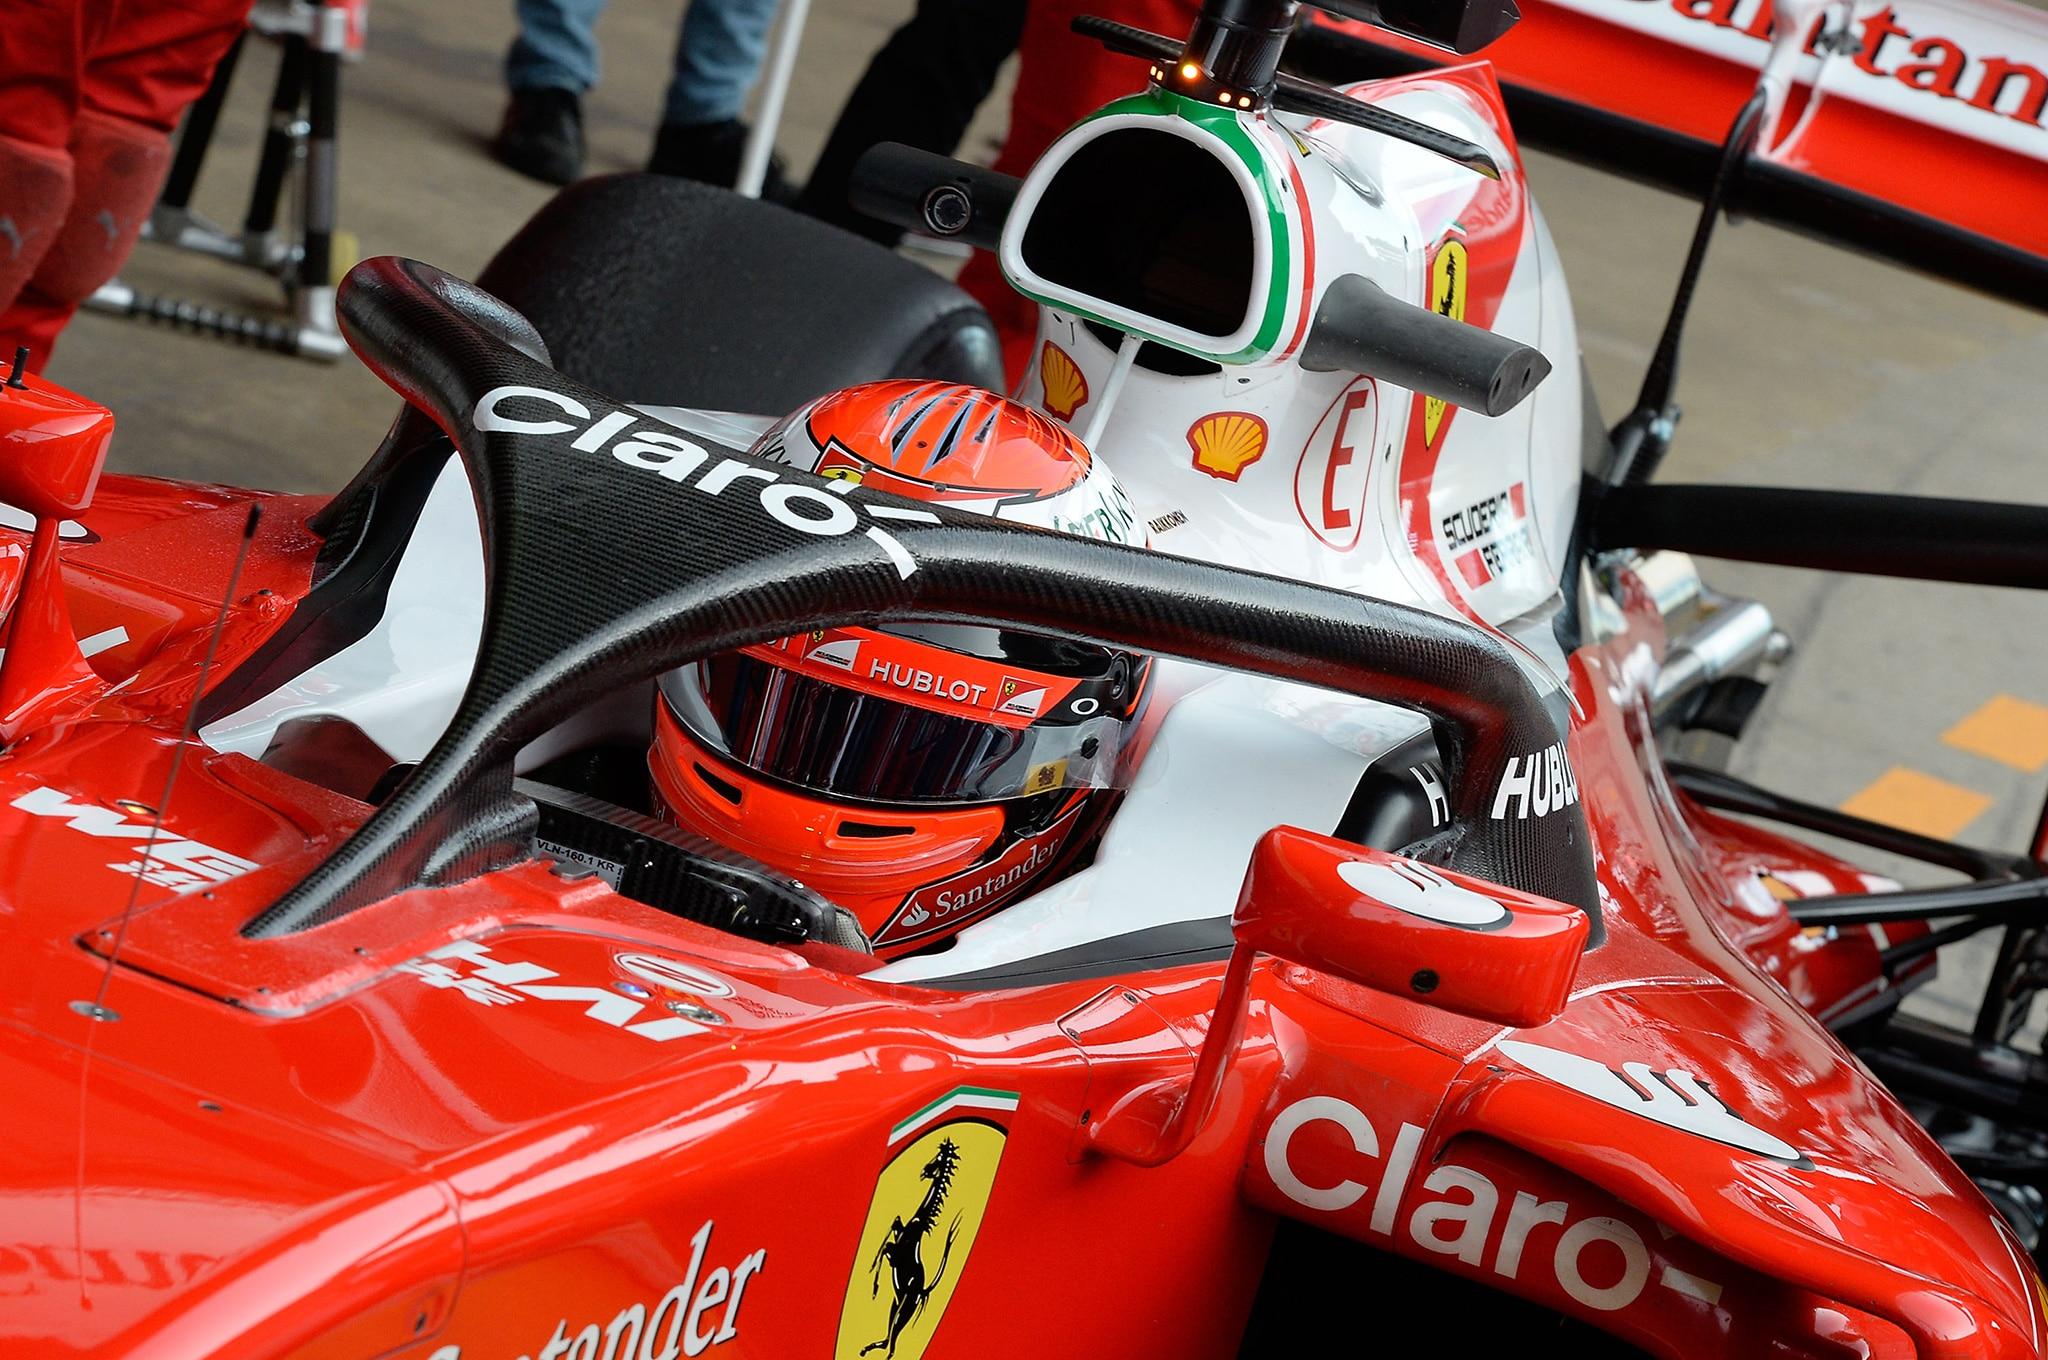 Ferrari Tests First Formula 1 Halo Safety System